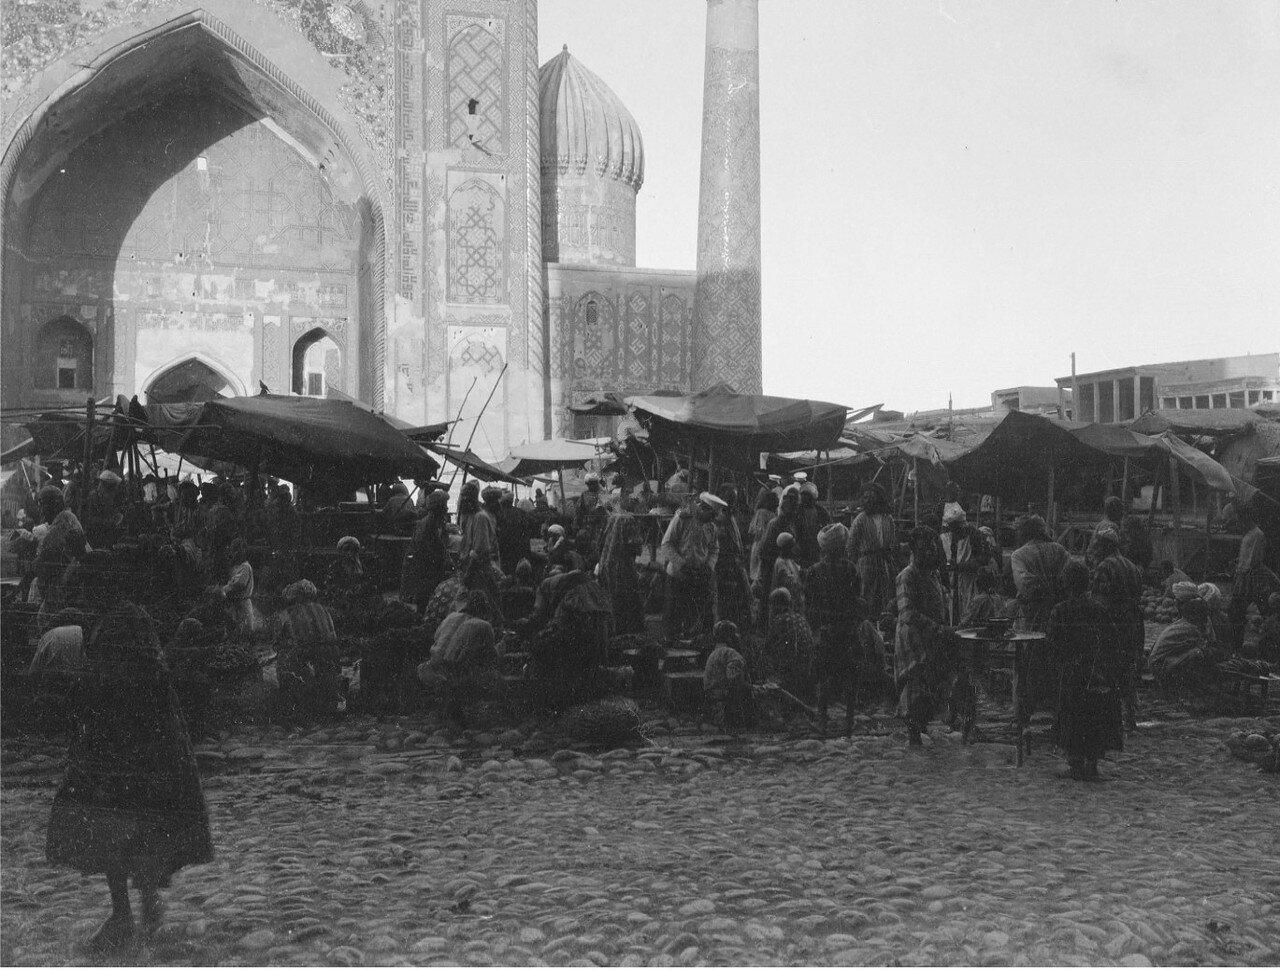 Самарканд. Площадь Регистан. Медресе Шердор